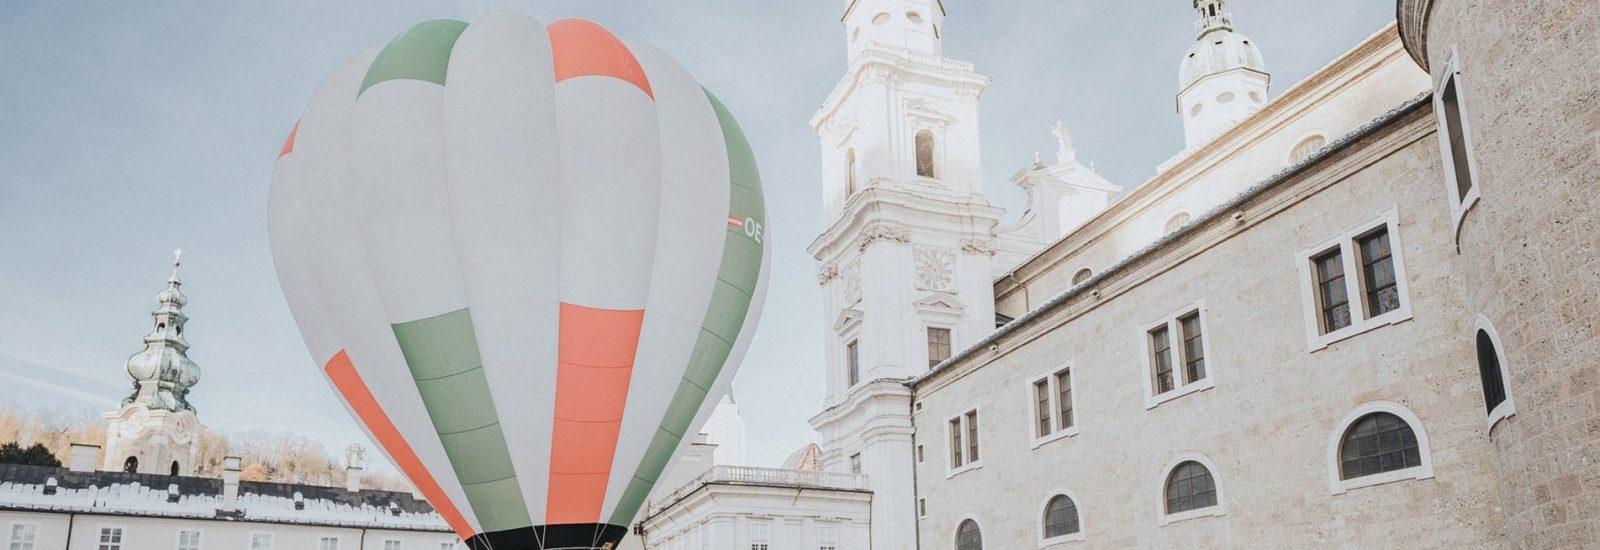 Heißluftballone in Salzburg, Ecco Ballooning Salzburg, Internationales Ballonmeeting Salzburg 2019